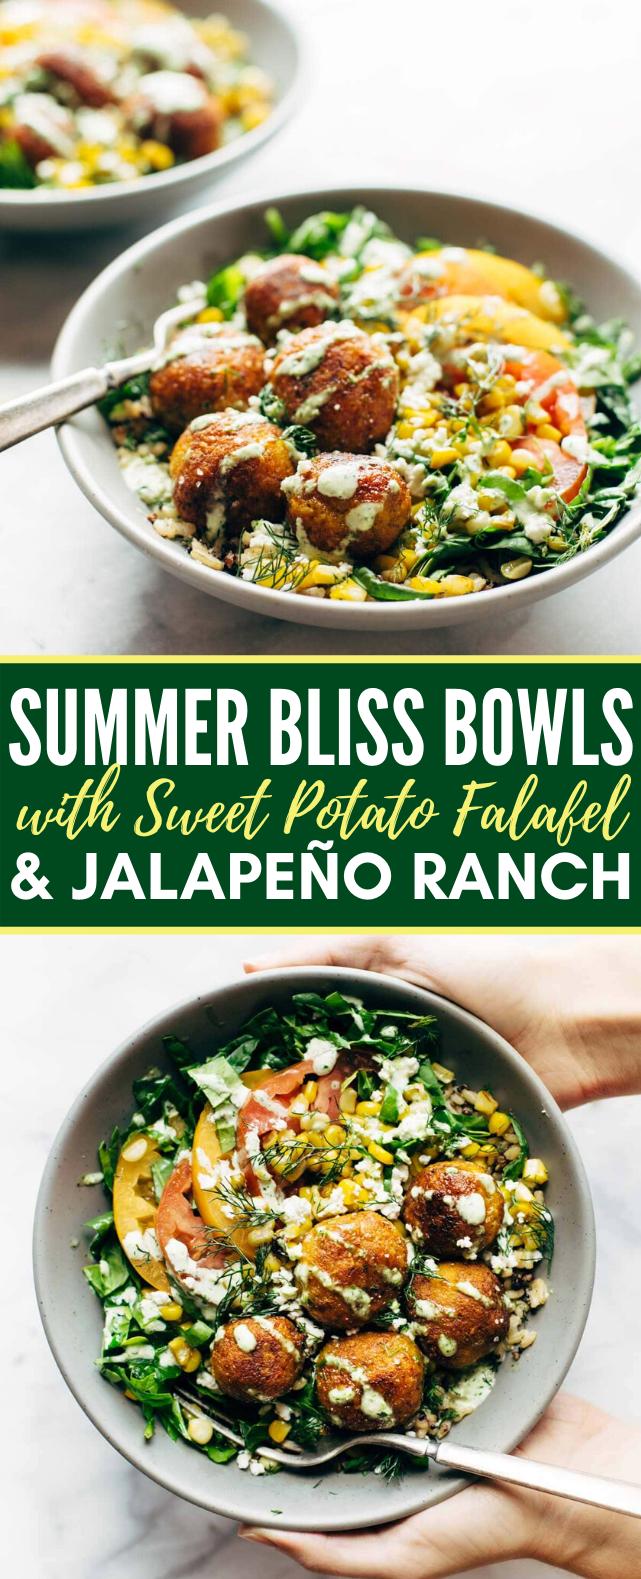 summer bliss bowls with sweet potato falafel and jalapeño ranch #vegetarian #summerrecipe #veggies #vegan #vegetables